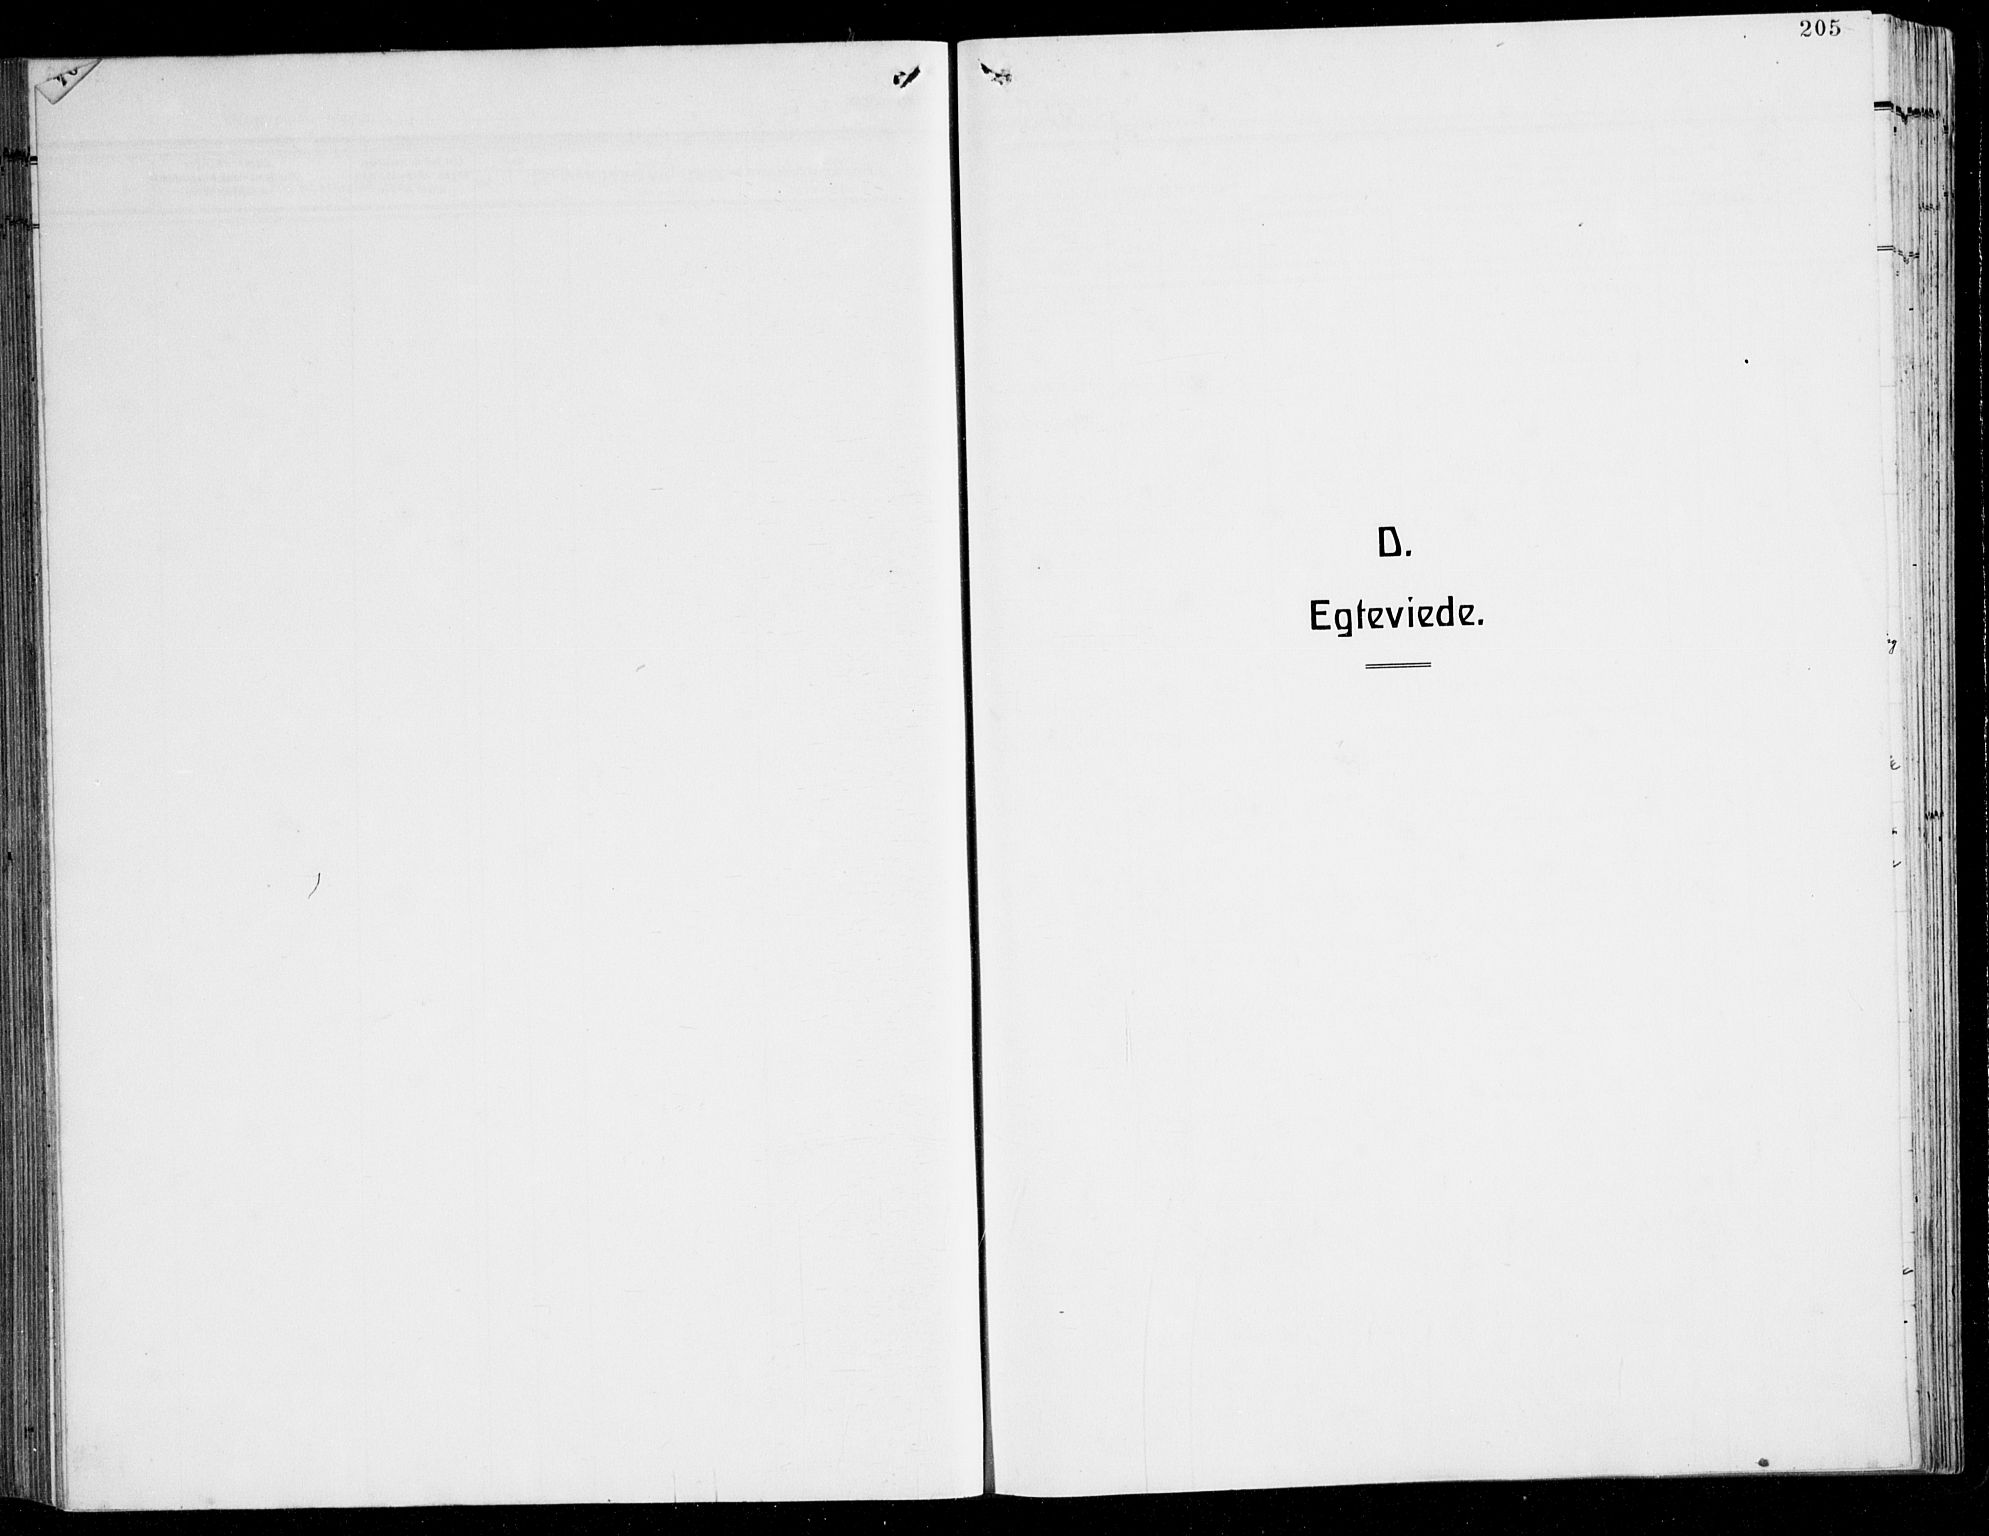 SAB, Herdla Sokneprestembete, H/Hab: Klokkerbok nr. C 3, 1926-1940, s. 205